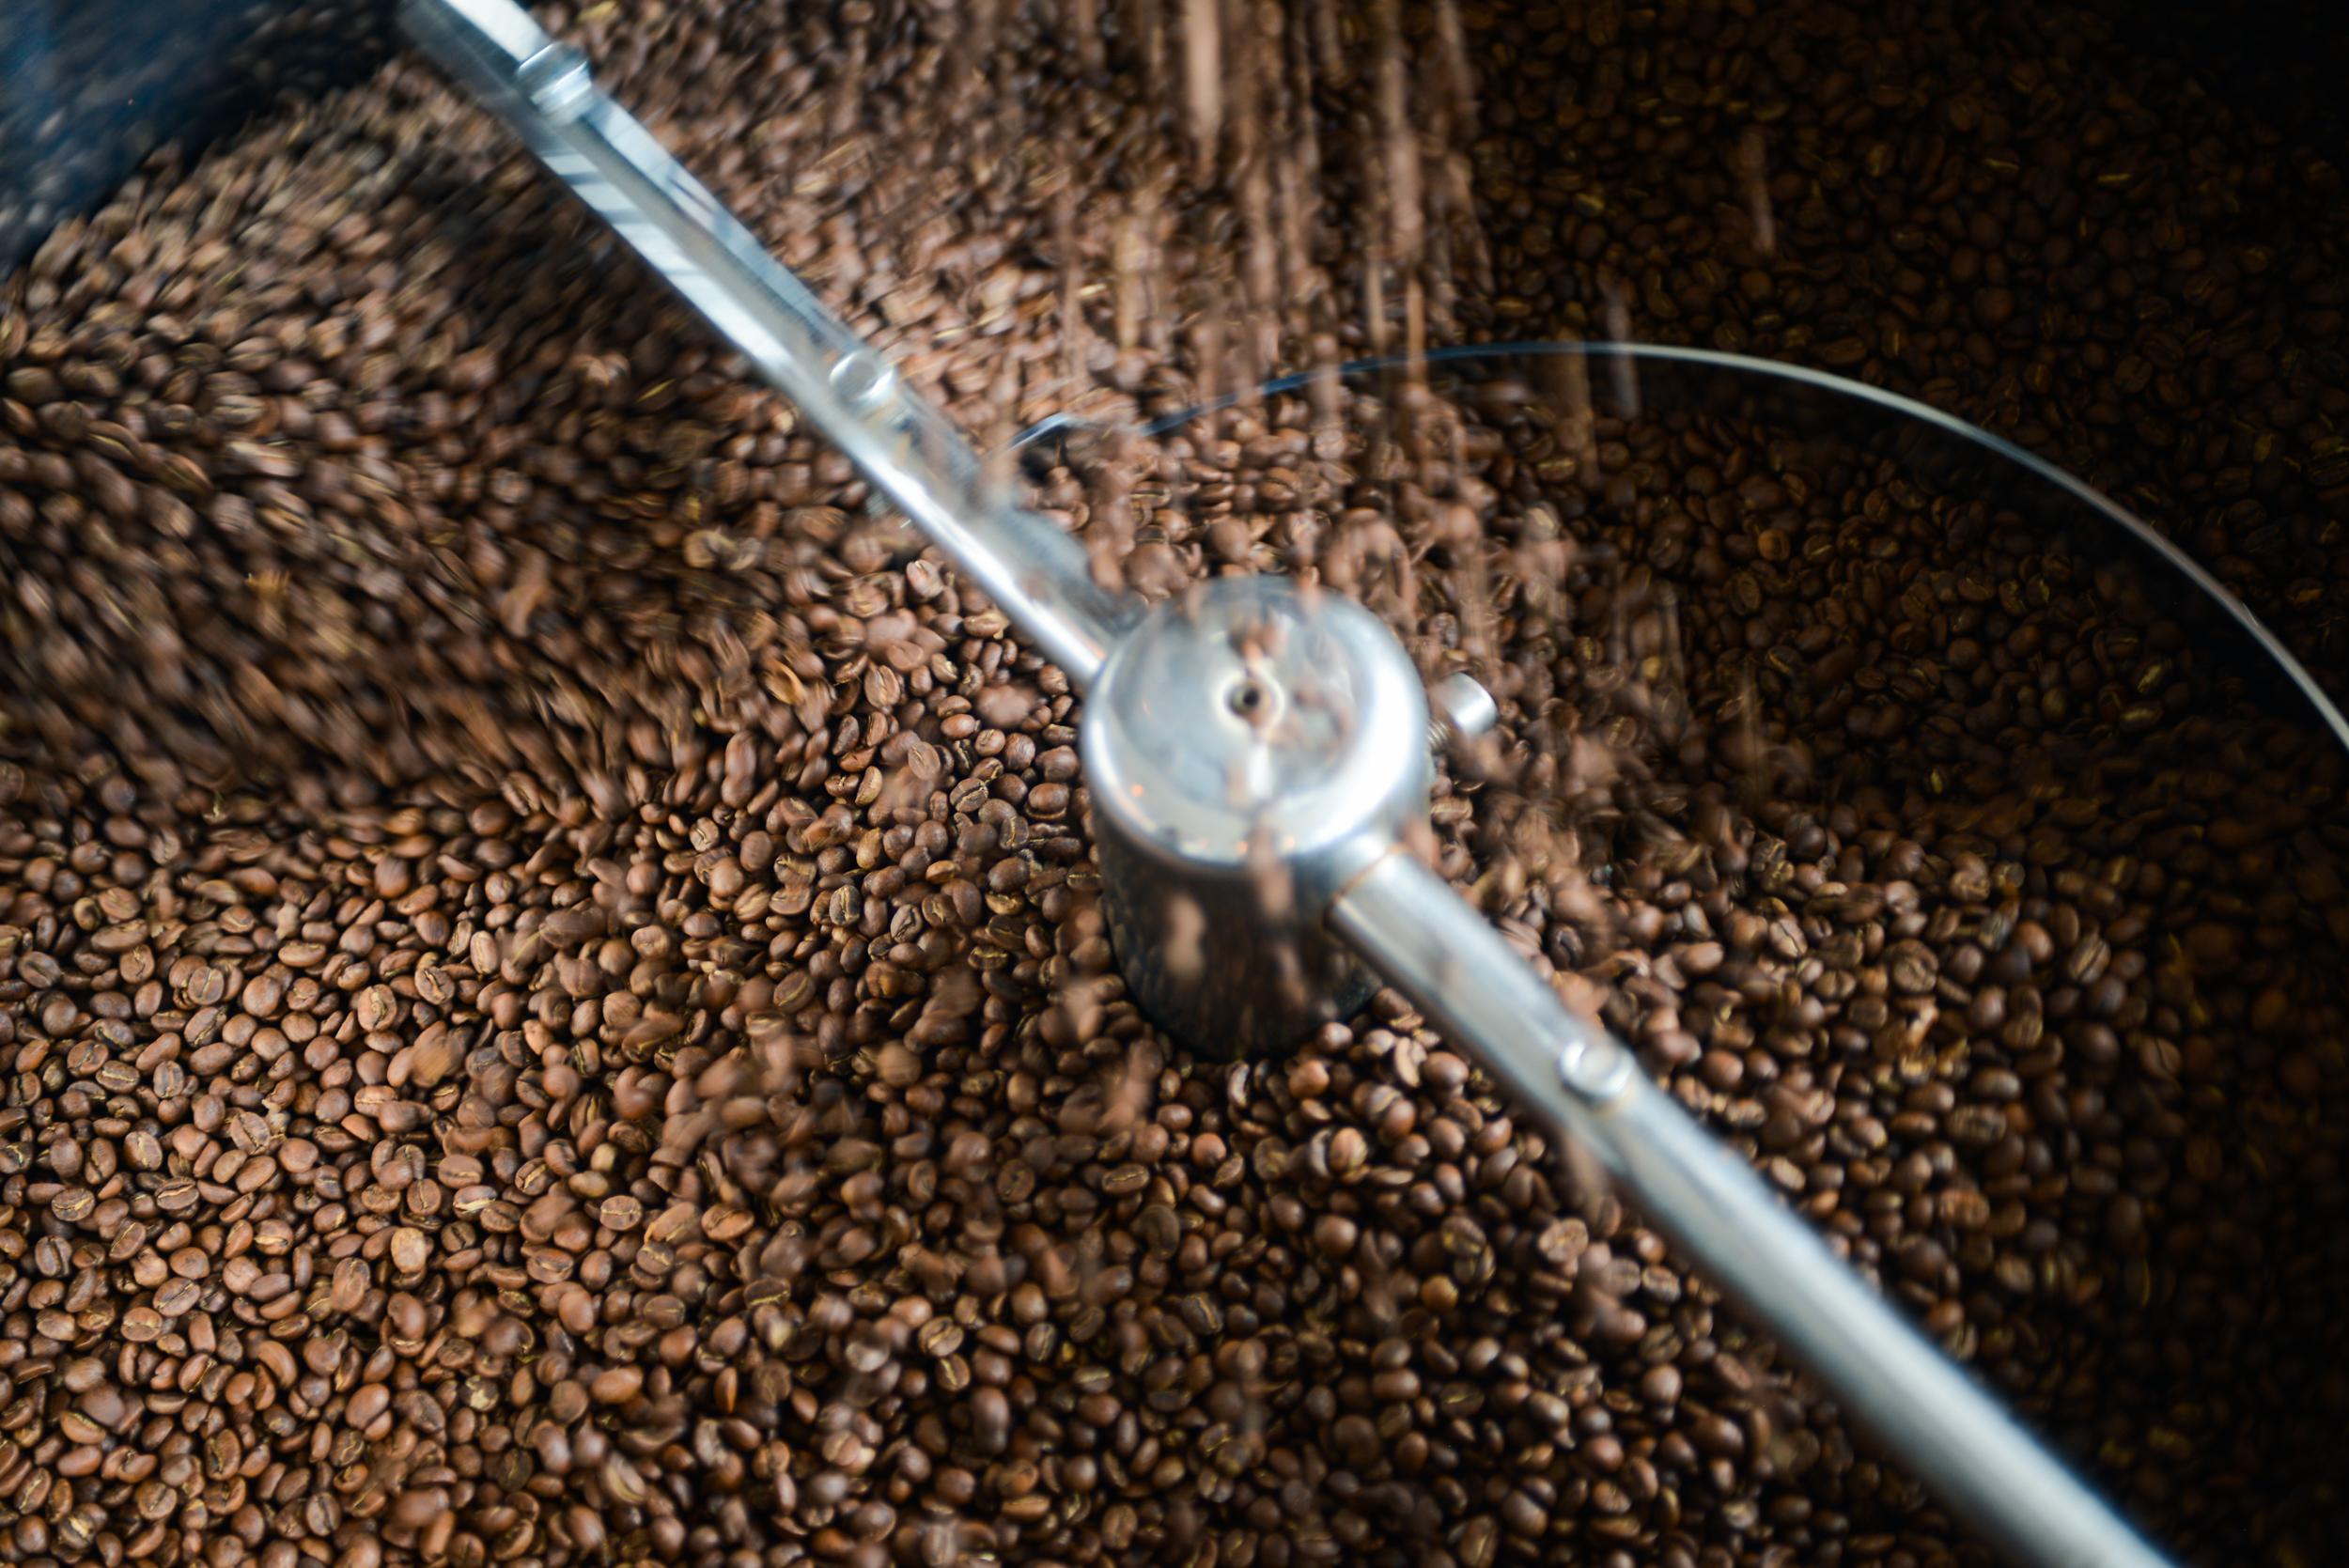 Locally Roasted & Ground Coffee! One Pound